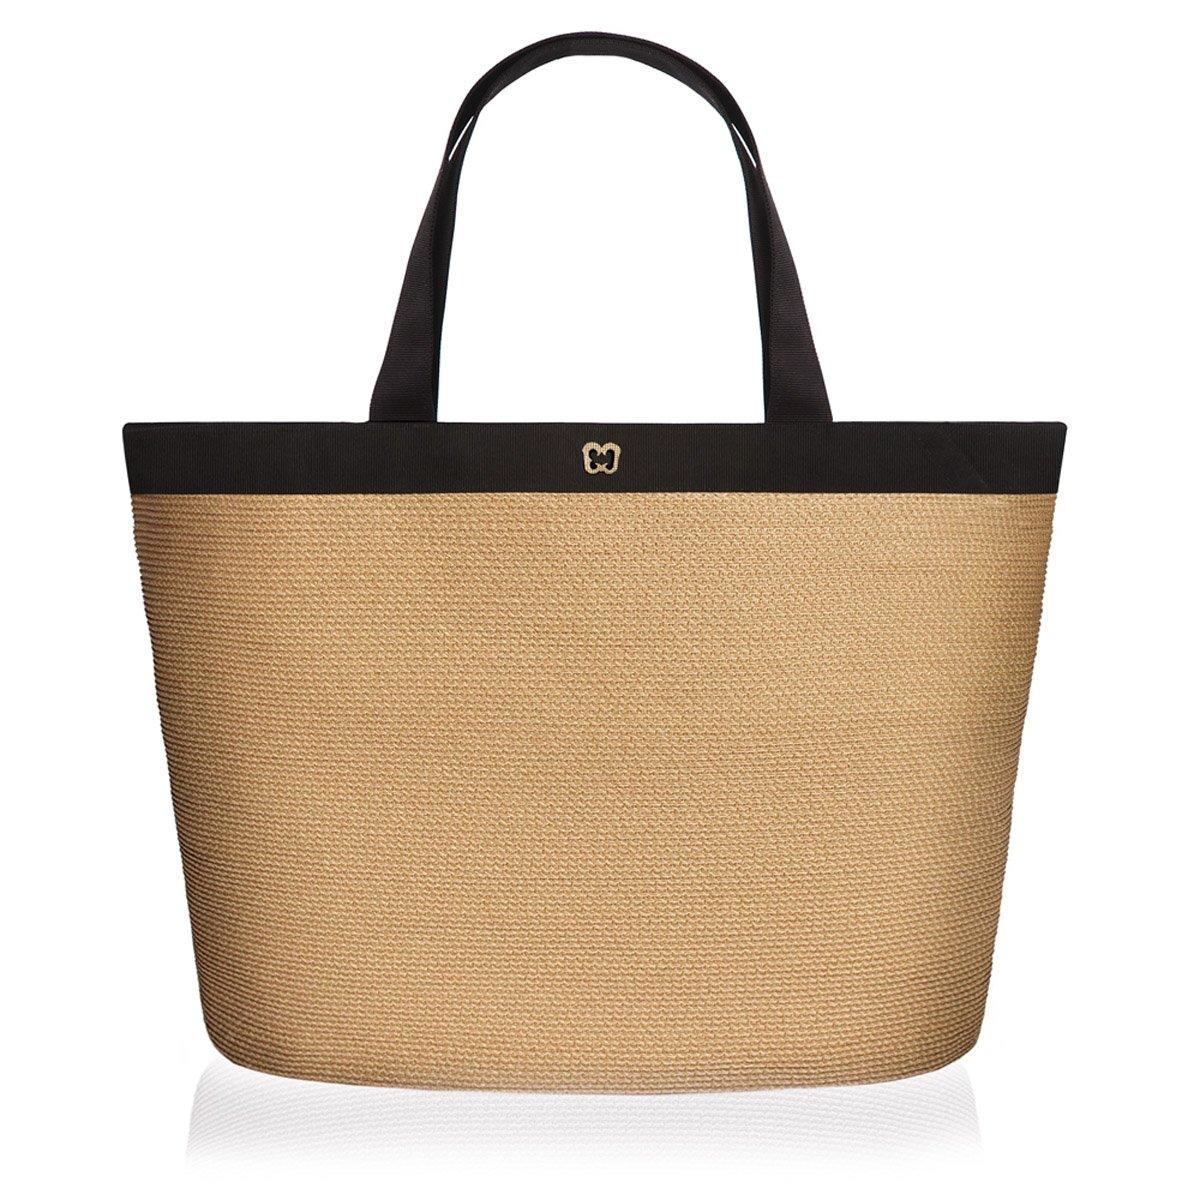 Eric Javits Luxury Fashion Designer Women's Handbag - Dunemere - Natural/Black